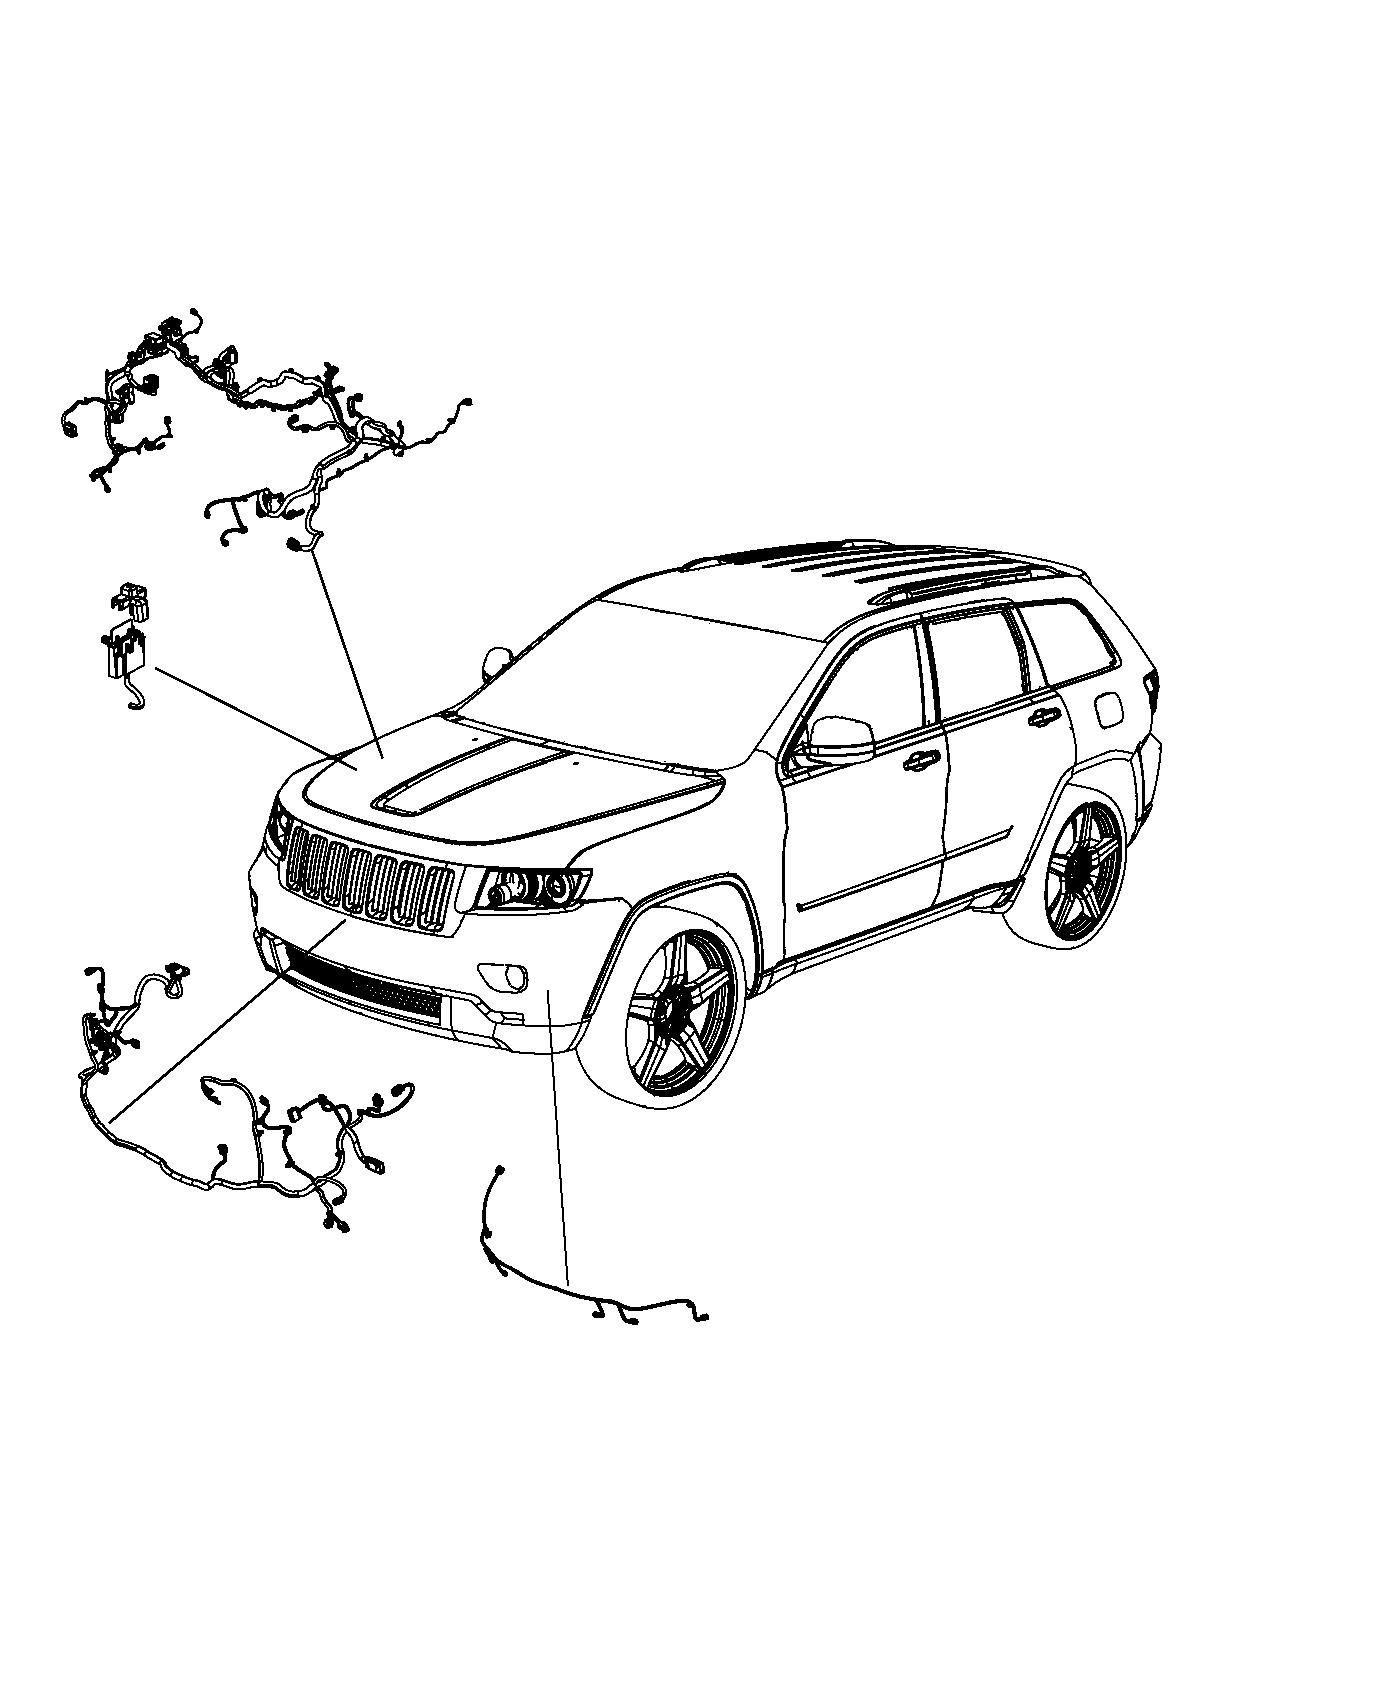 tags: #jeep xj fog light wiring#2000 jeep wrangler wiring diagram#2000 jeep  cherokee headlight wiring schematic#2000 cherokee wiring diagram#2000 jeep